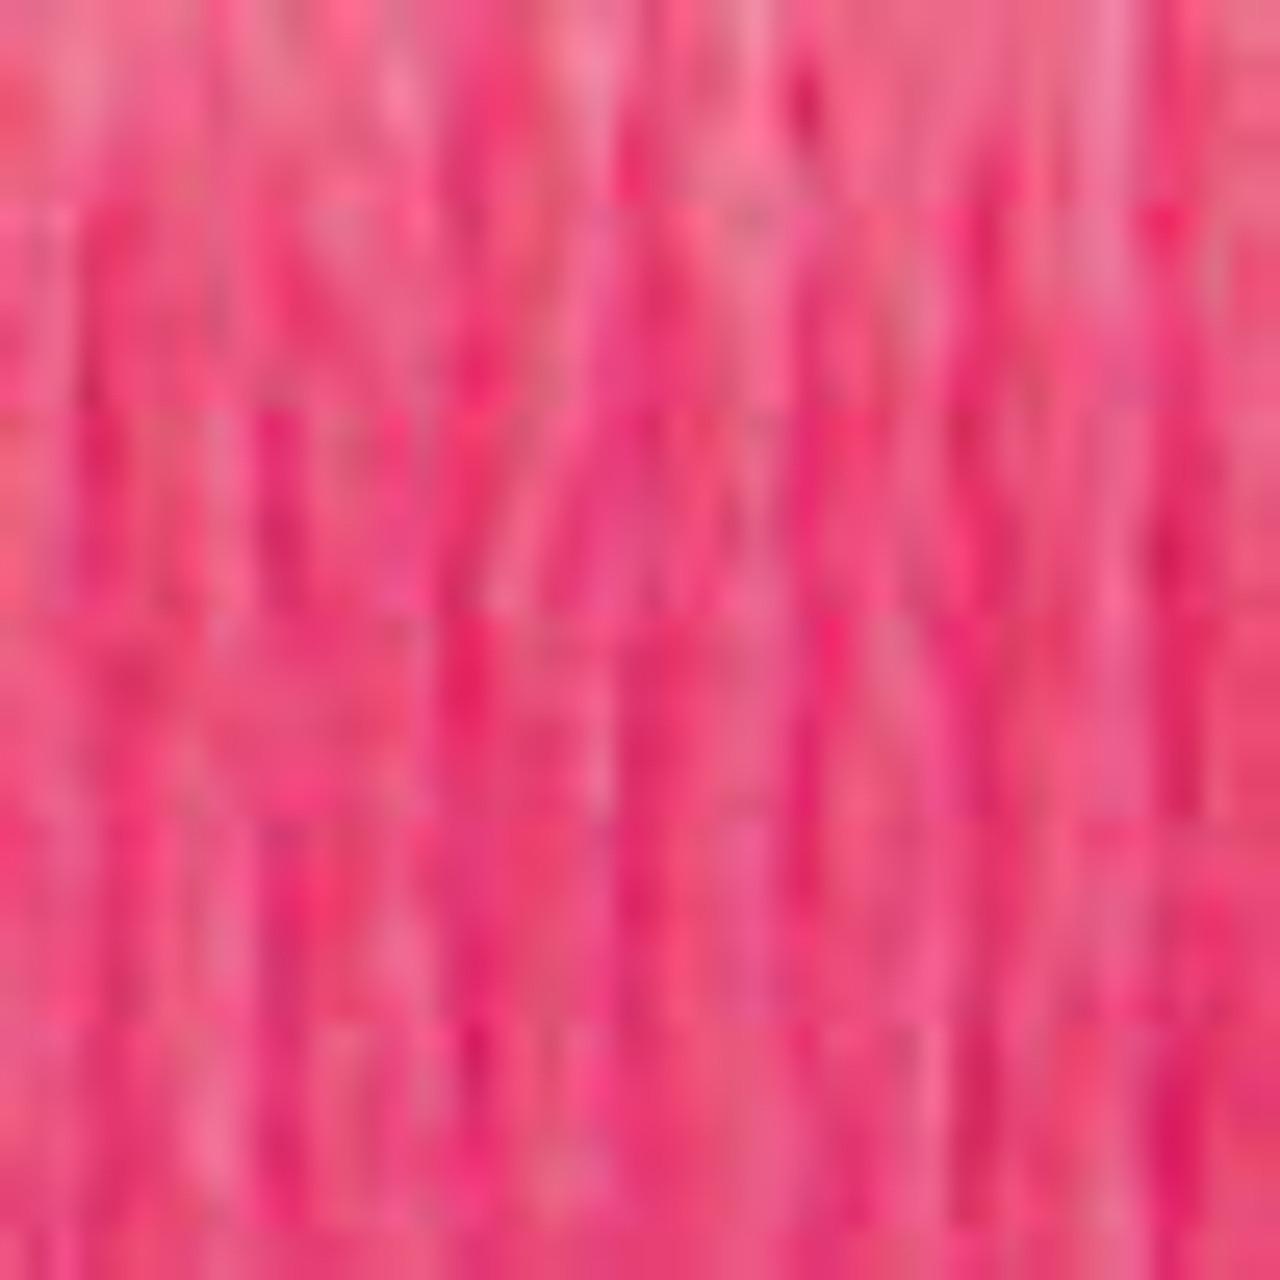 DMC # 3805 Cyclamen Pink Floss / Thread